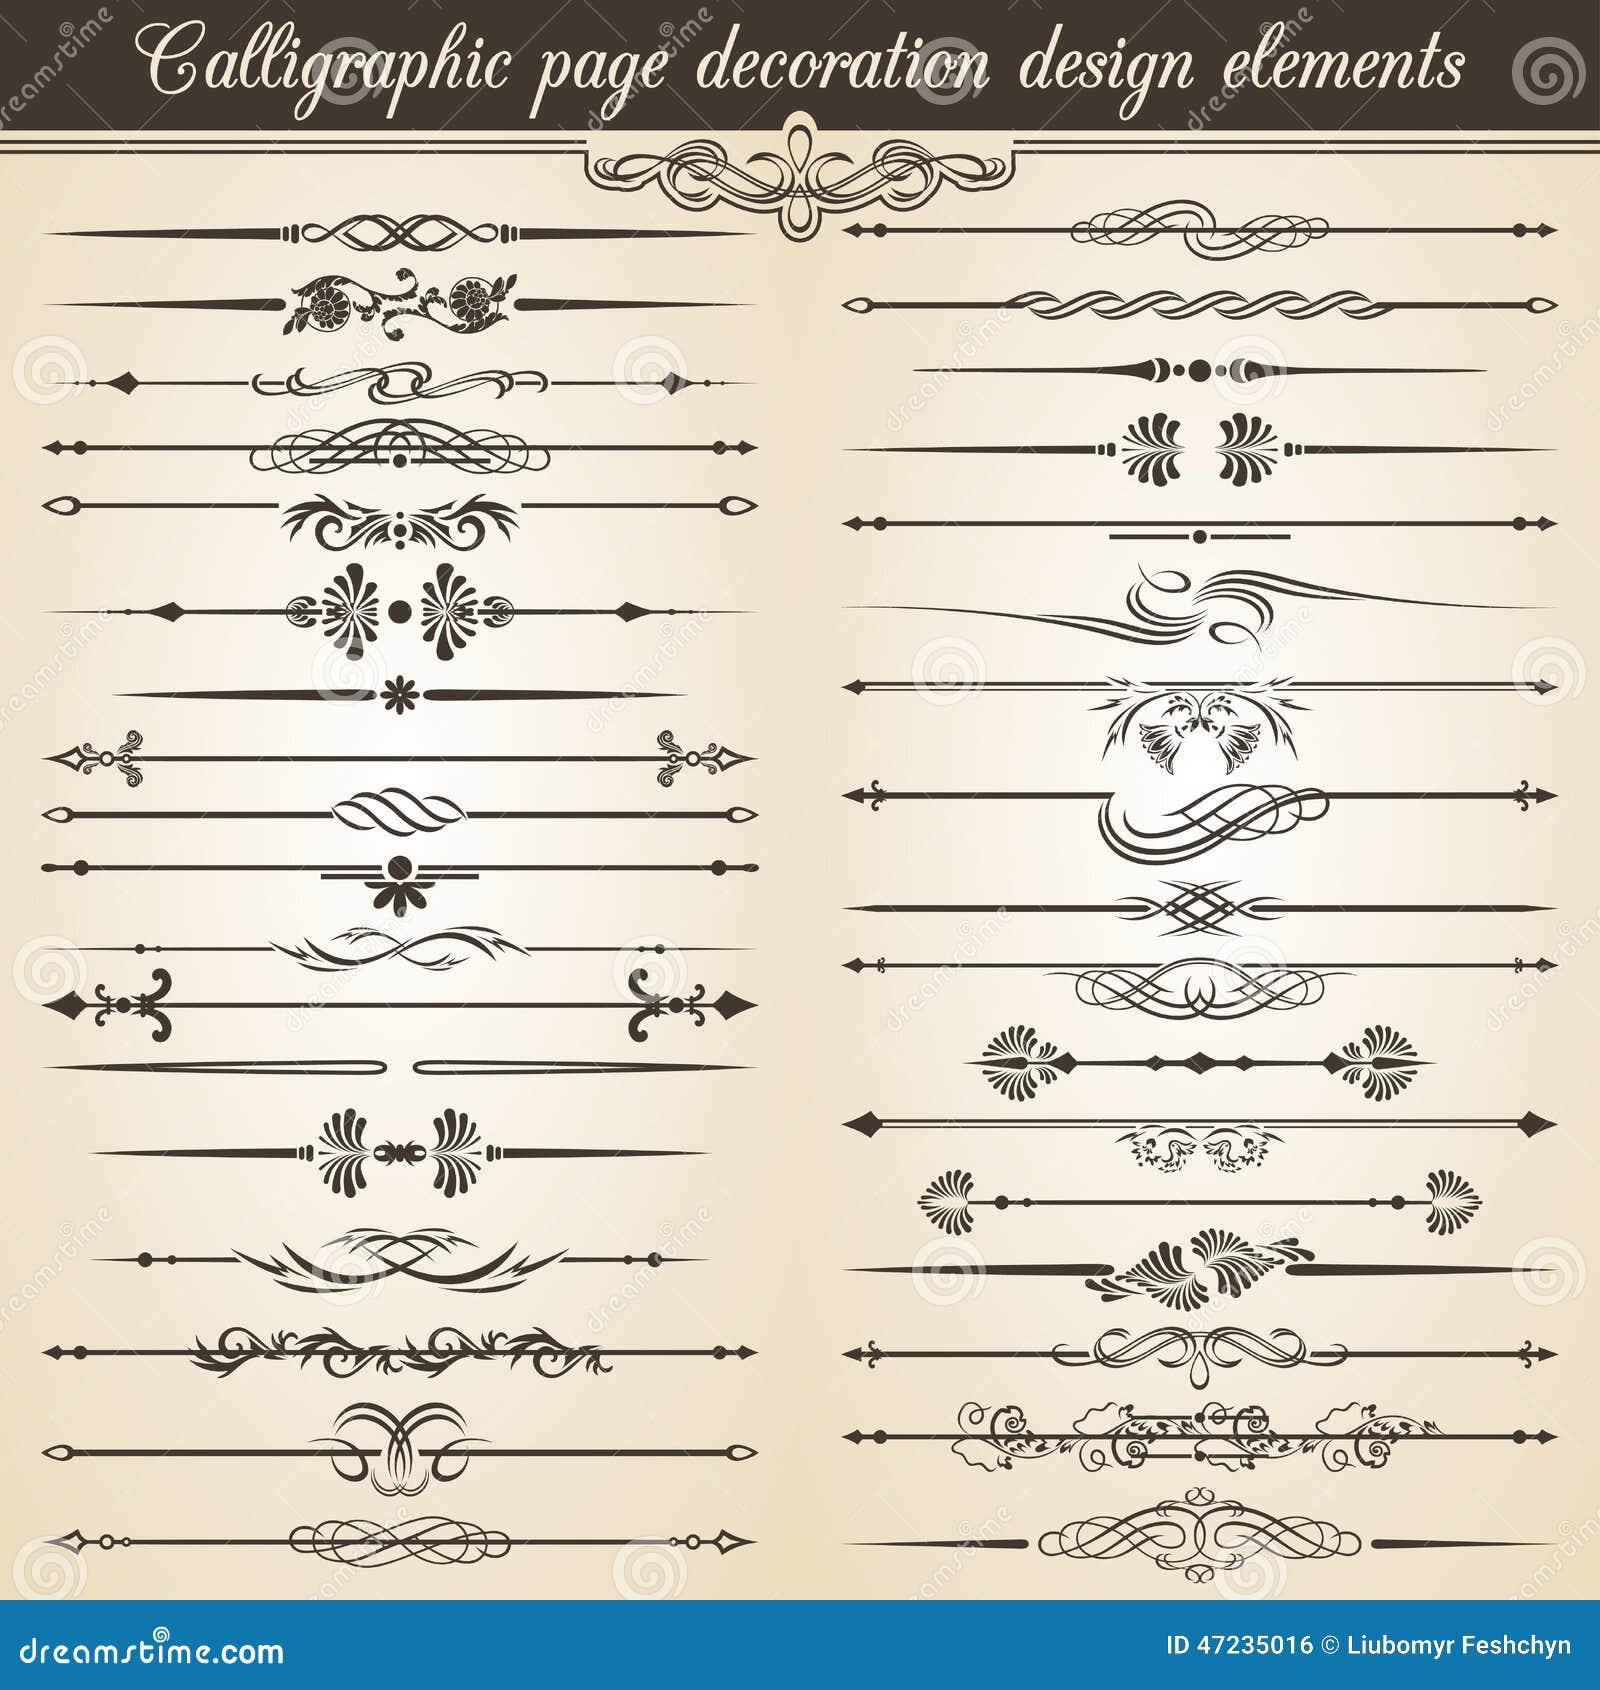 Calligraphic Vintage Page Decoration Design Elements ...